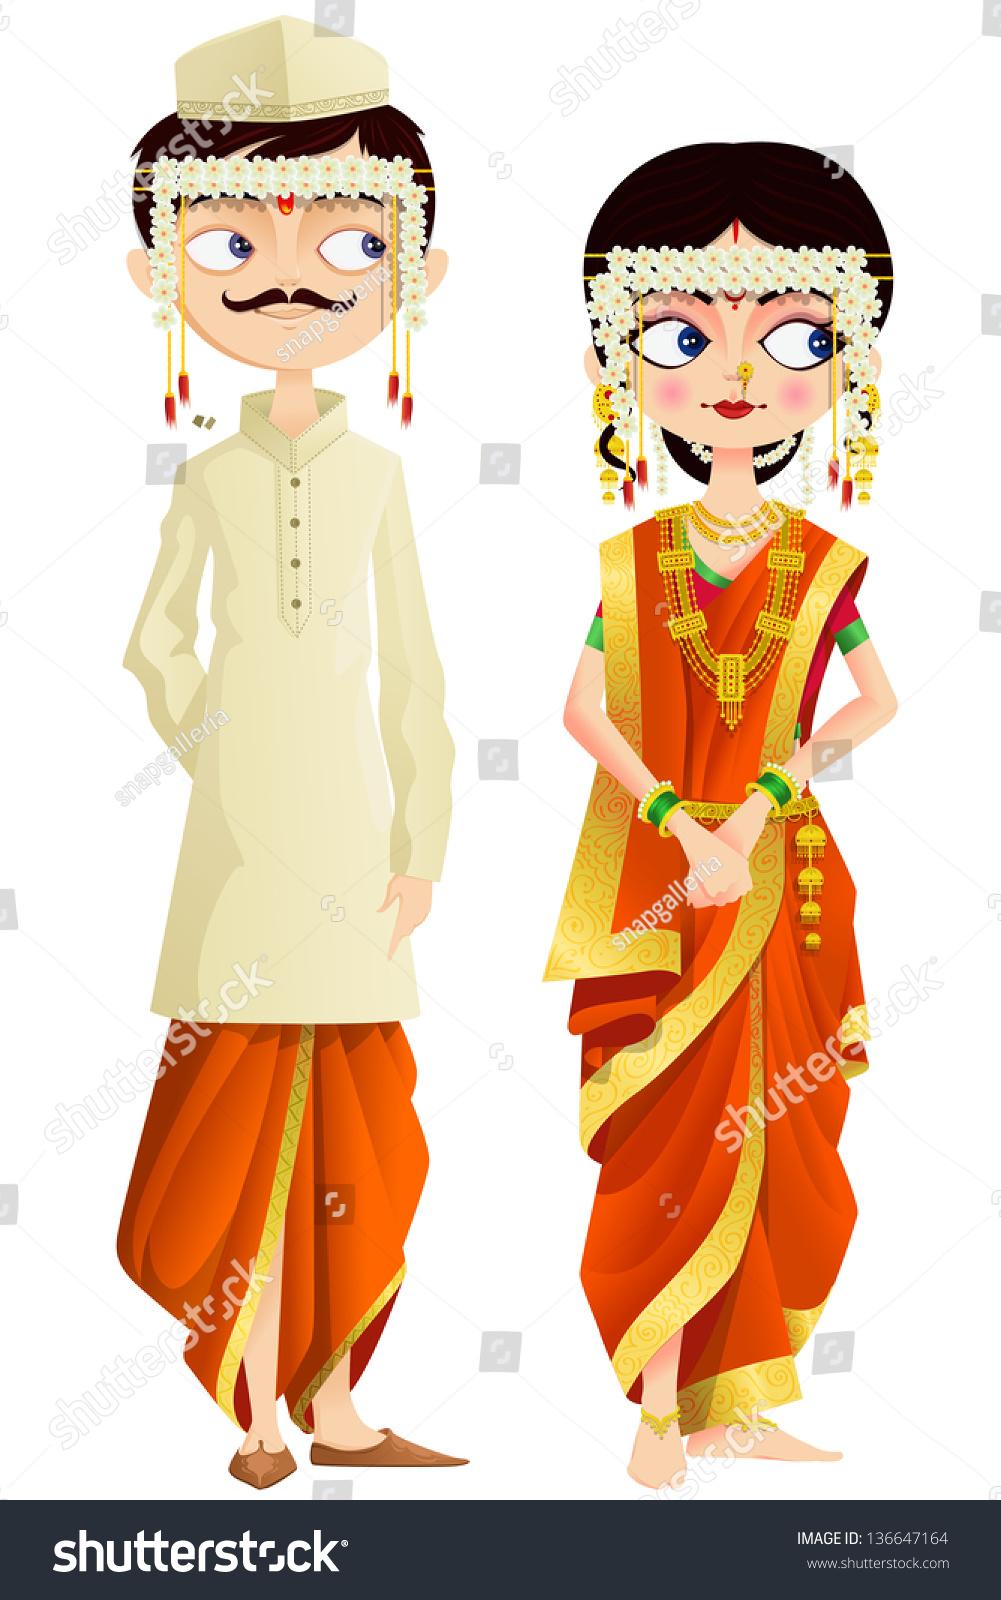 Easy To Edit Vector Illustration Of Maharashtrian Wedding